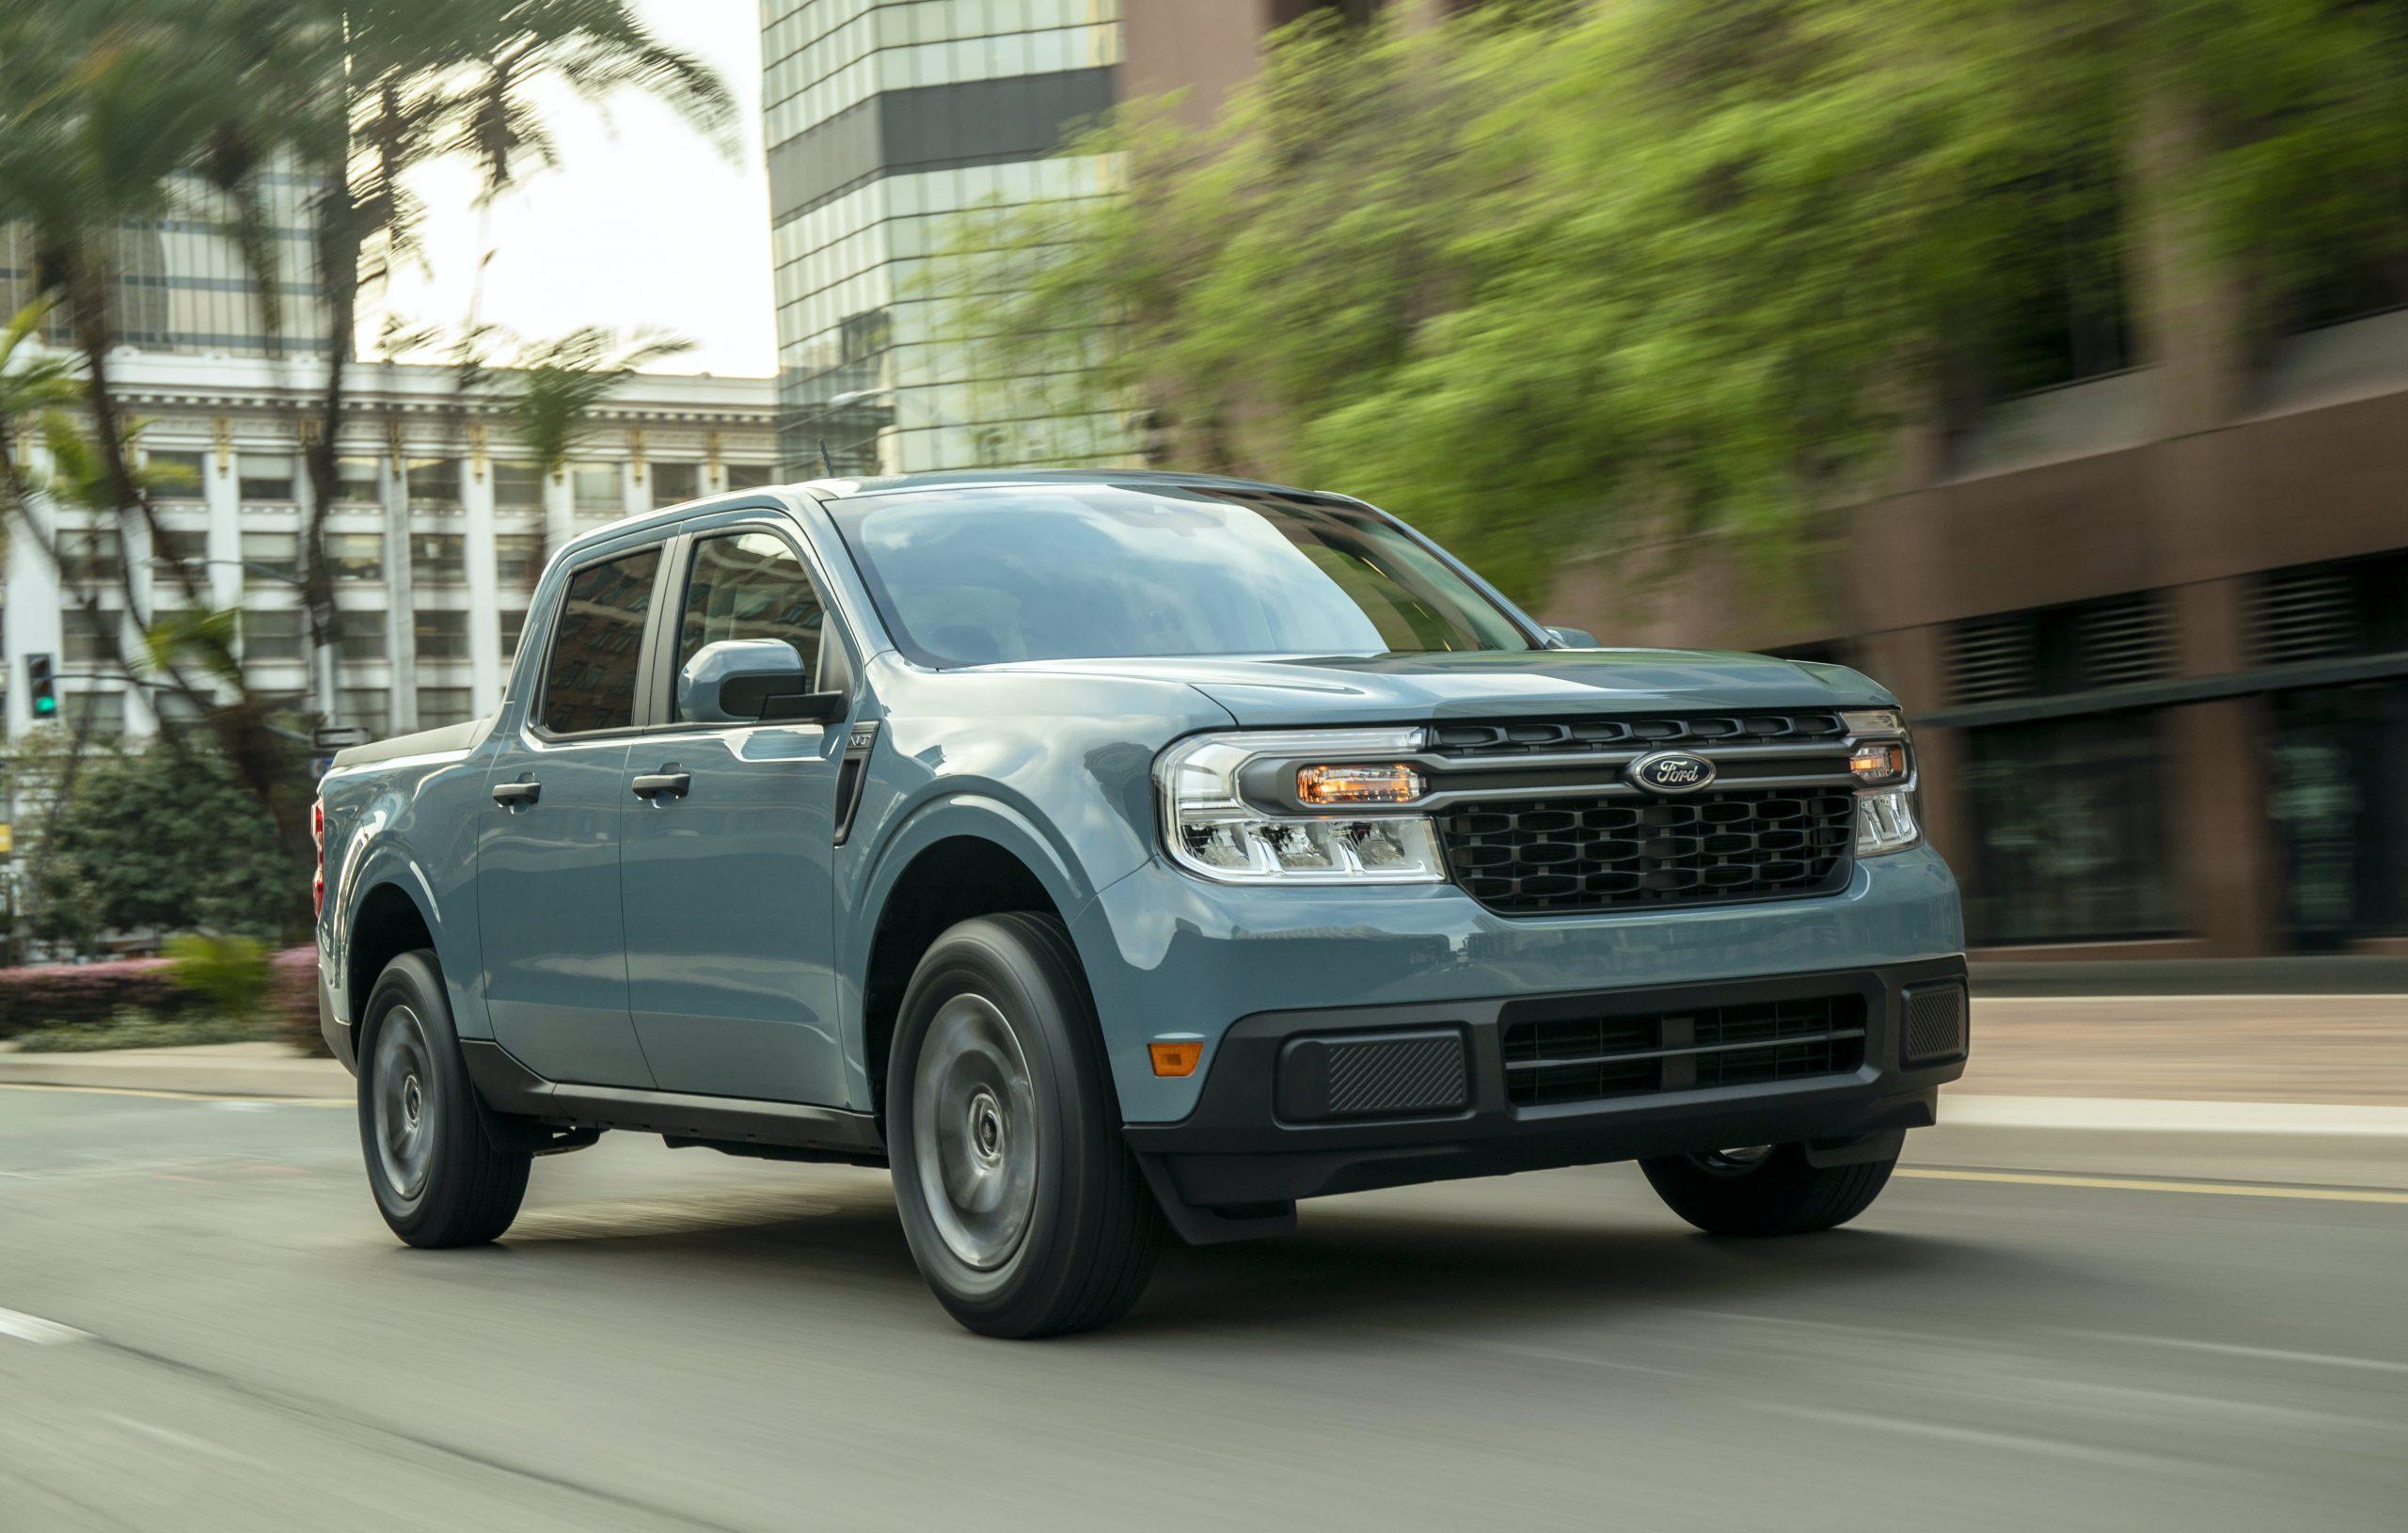 Ford's new Maverick hybrid pickup starts at $19,995 and gets 40 mpg